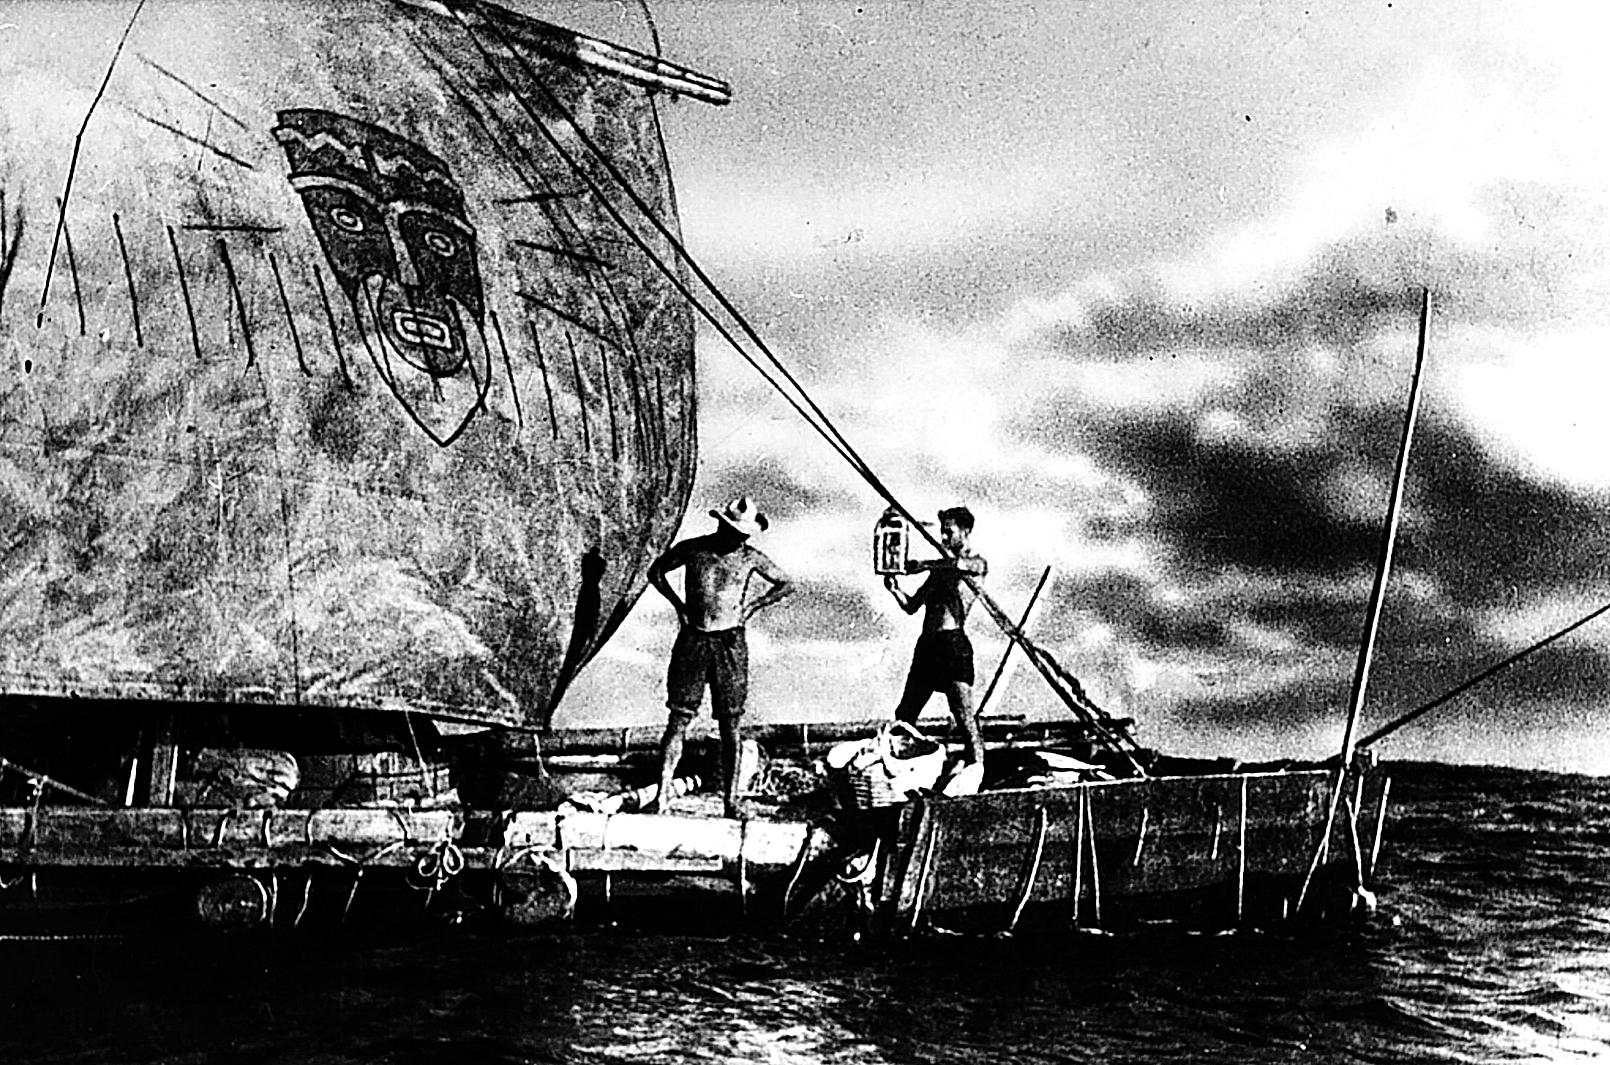 Thor Heyerdahl, cruzando el Pacífico en la balsa 'Kon-Tiki', en 1952.